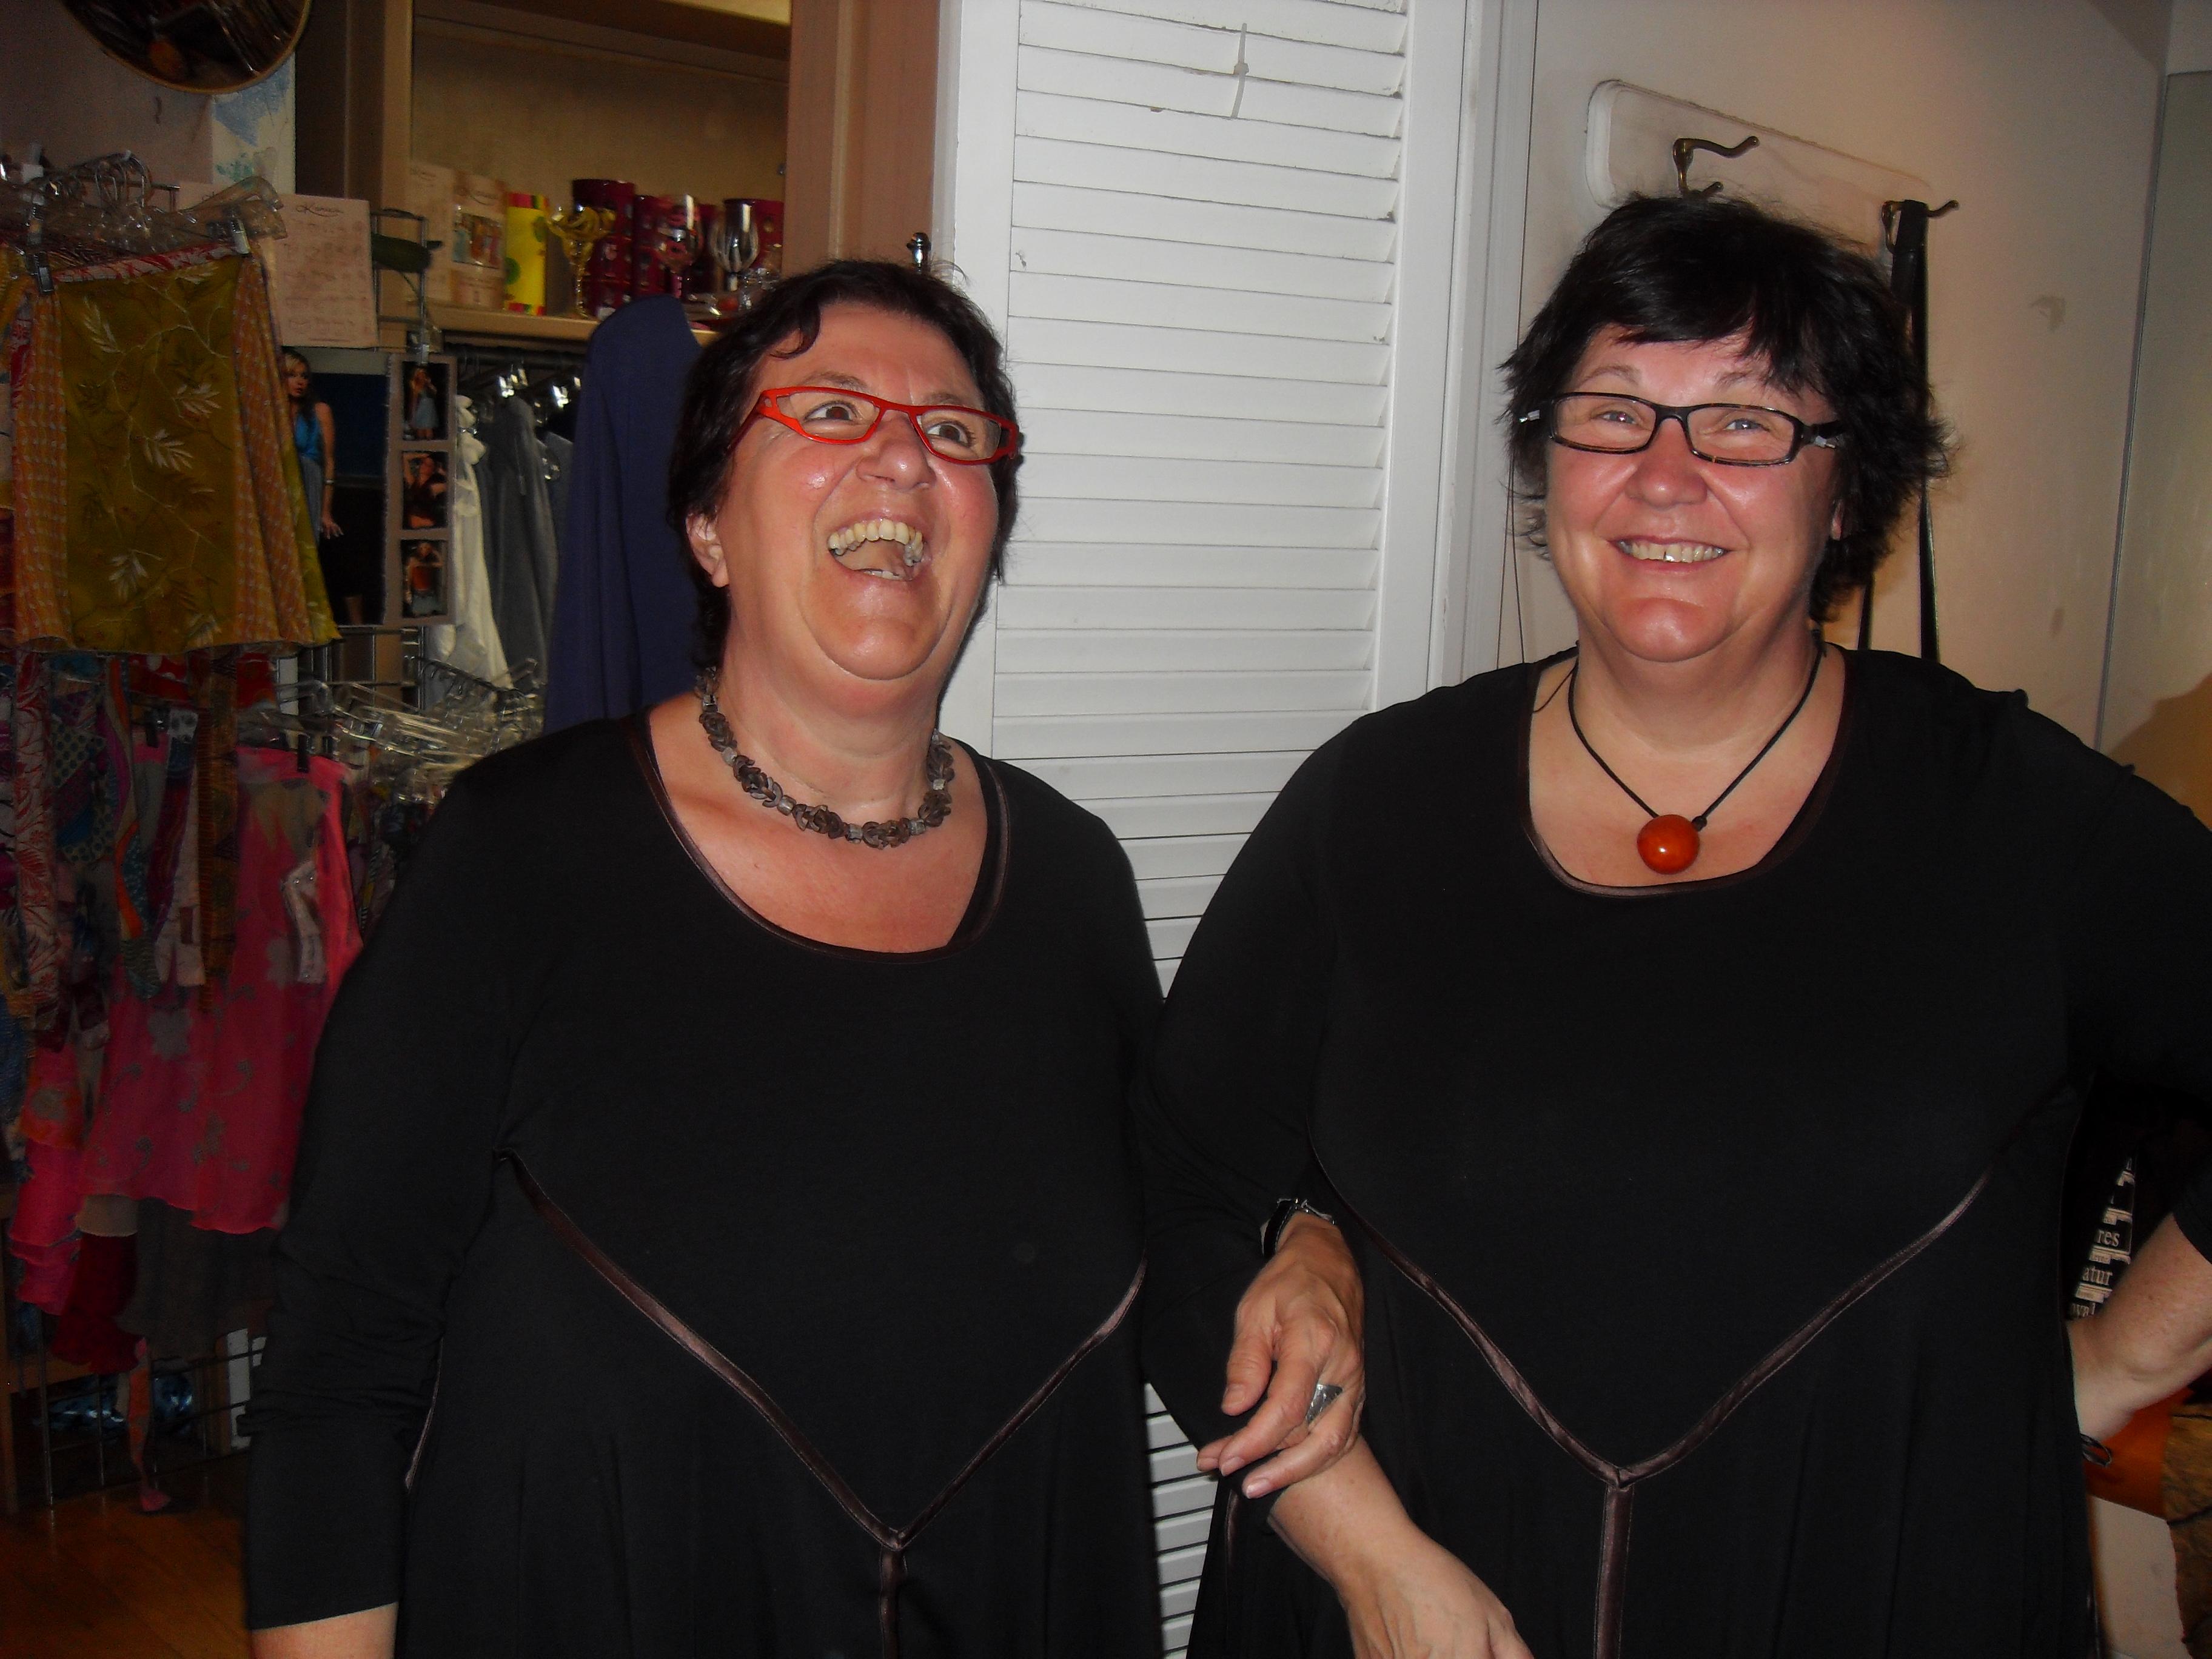 Shopping. Twins?!?